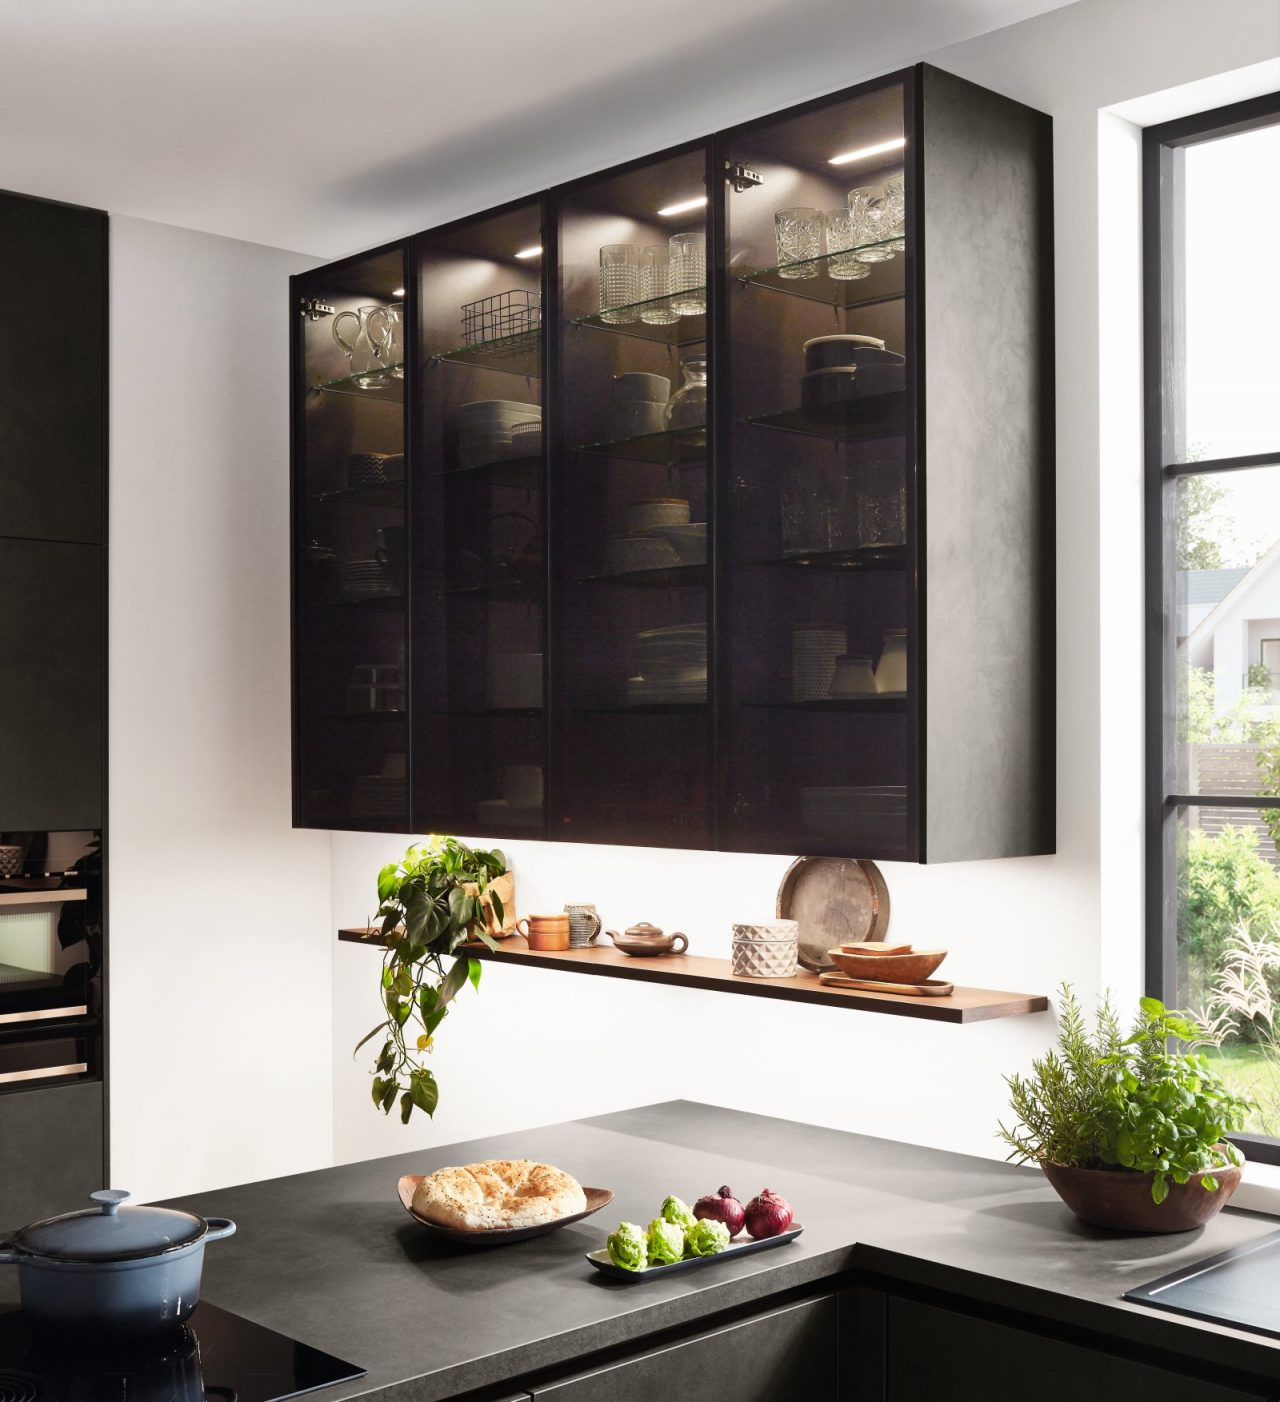 Meble kuchenne NOBILIA RIVA 839 szary terra beton, imitacja, melamina - Kuchnie na wymiar - FM KUCHNIE Kraków